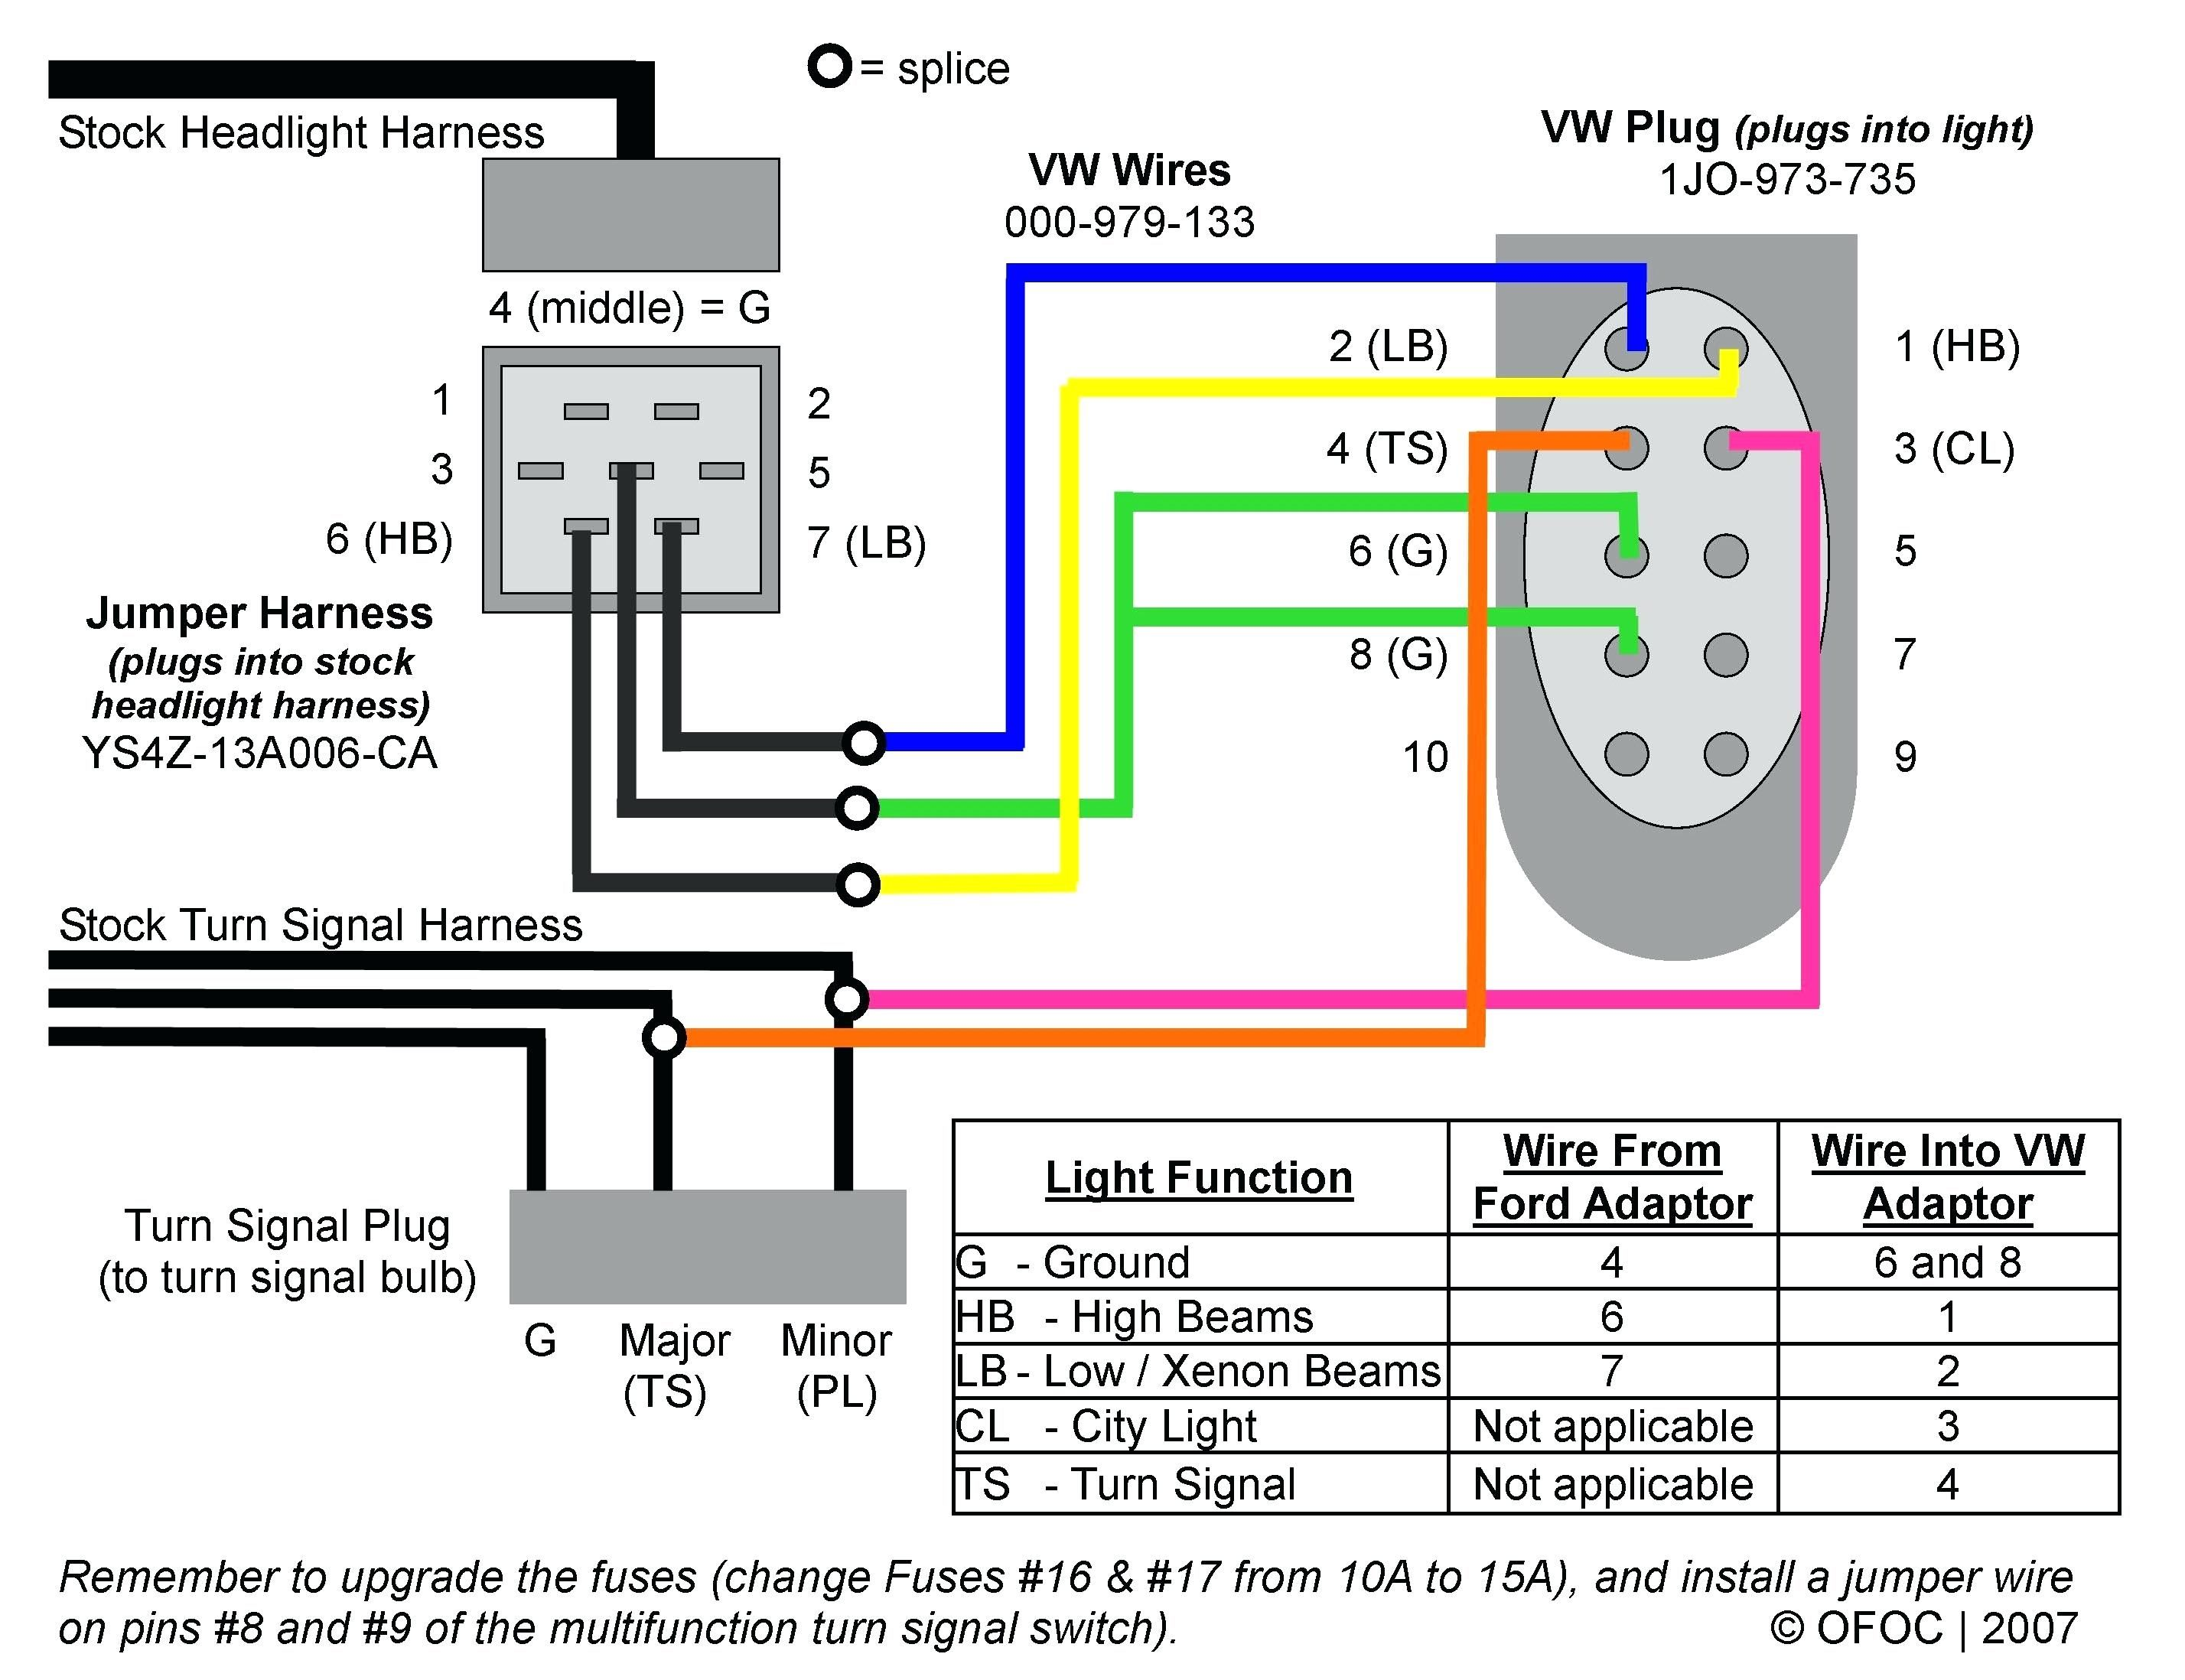 Bazooka Bass Tube Wiring Diagram - bookingritzcarlton.info | Diagram, Wire,  Volkswagen jetta Pinterest